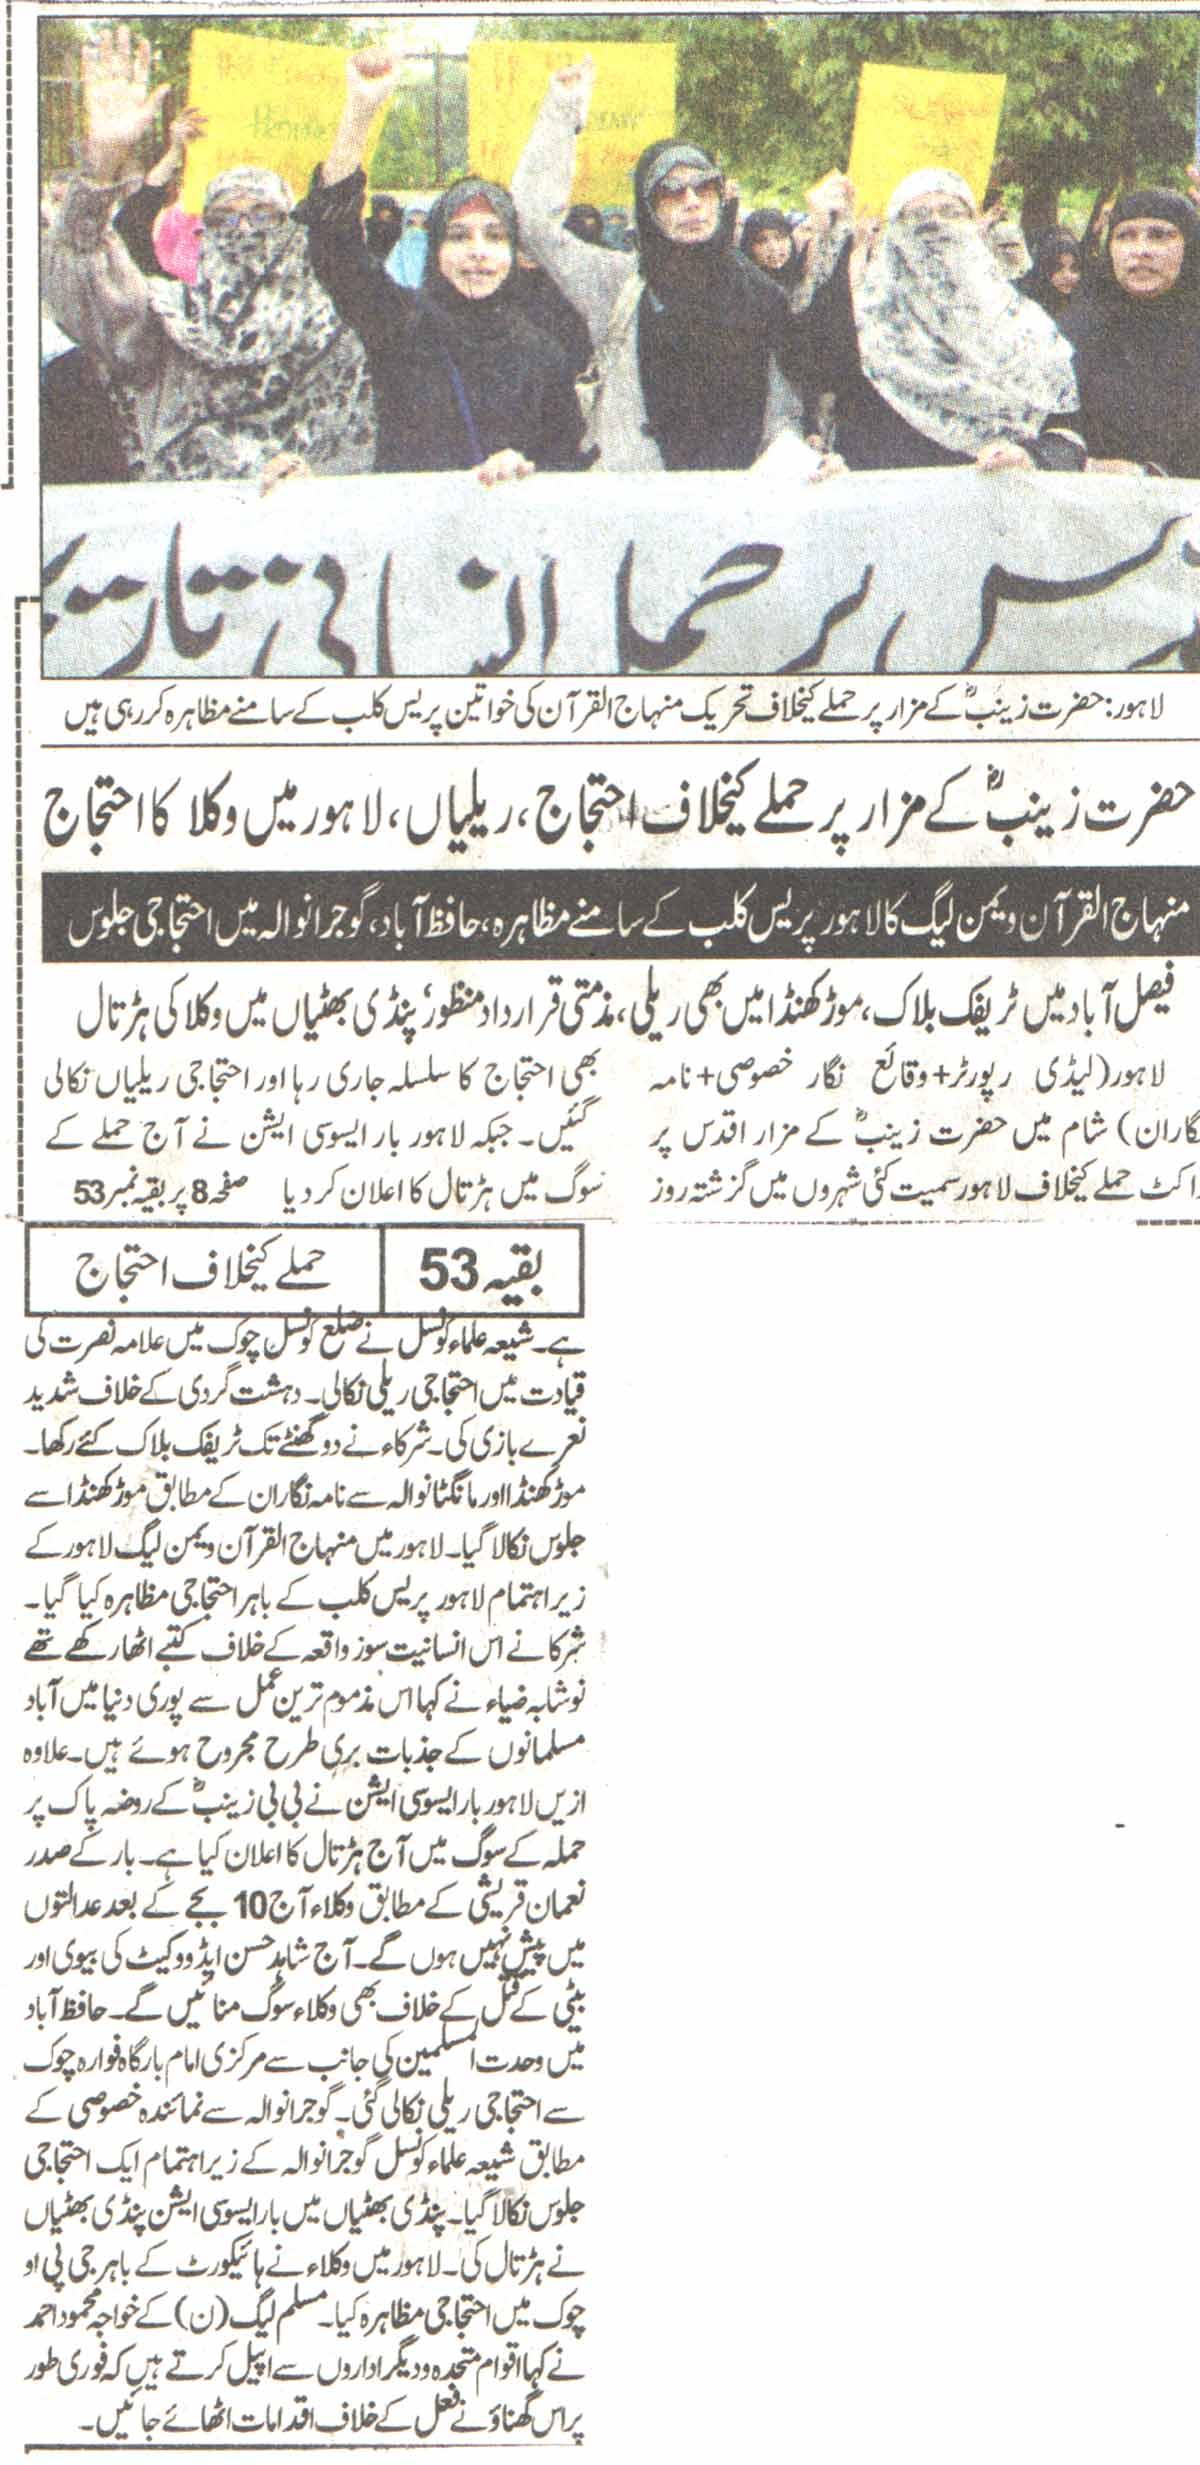 تحریک منہاج القرآن Minhaj-ul-Quran  Print Media Coverage پرنٹ میڈیا کوریج Daily Nawa-i-Waqat Back Page